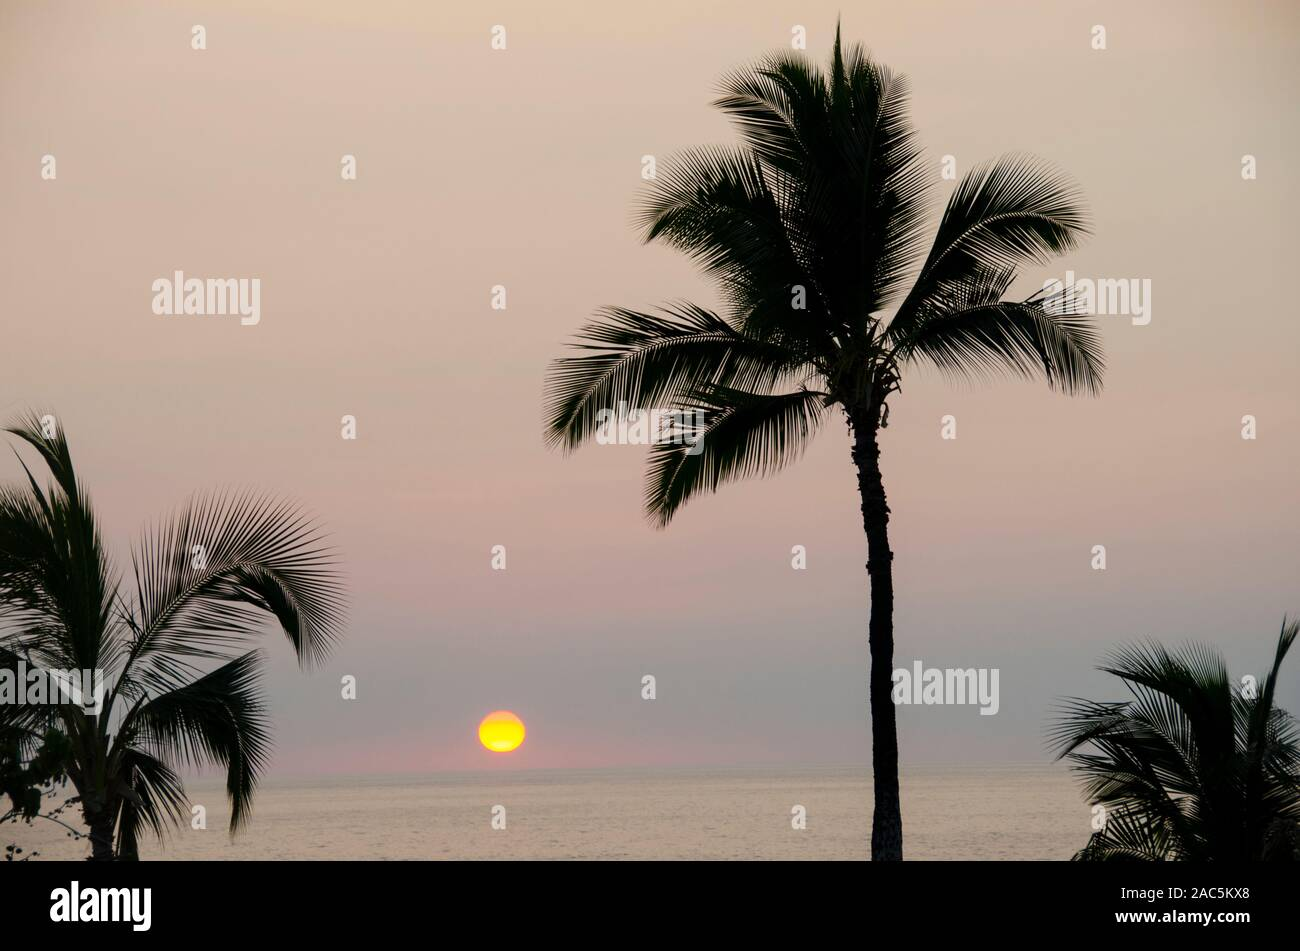 Silhouetted palm trees frame a beautiful sunset at Hapuna Beach, Island of Hawai'i. Stock Photo